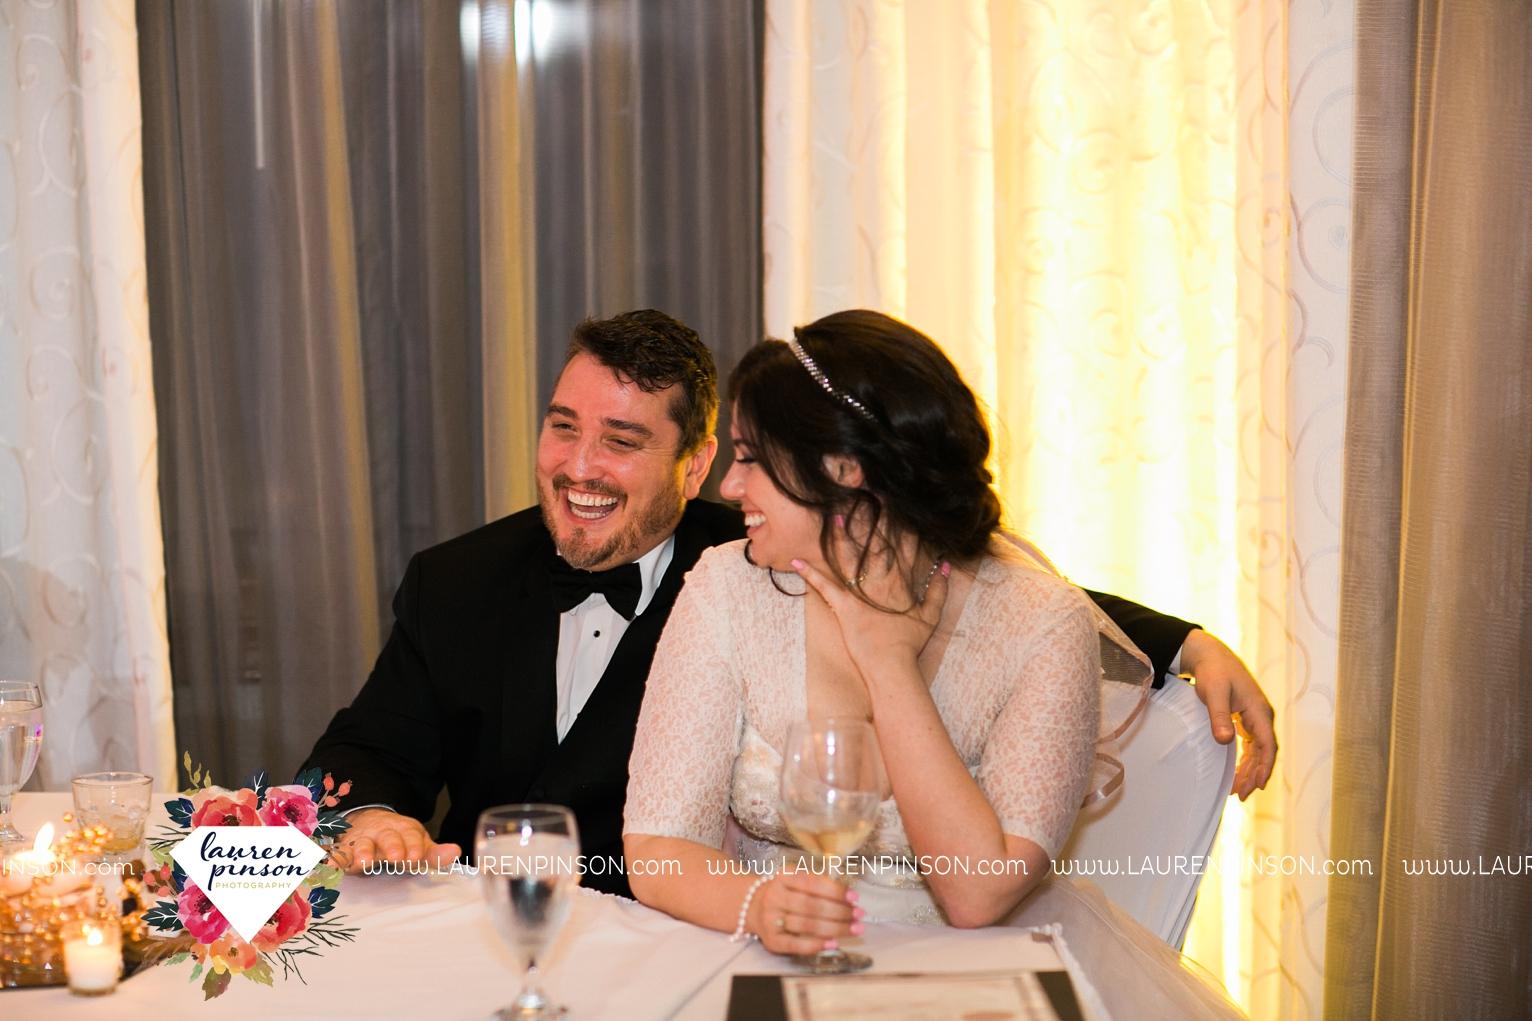 gainesville-texas-sherman-texas-thackerville-oklahoma-wedding-photographer-at-winstar-casino-golf-resort_2301.jpg